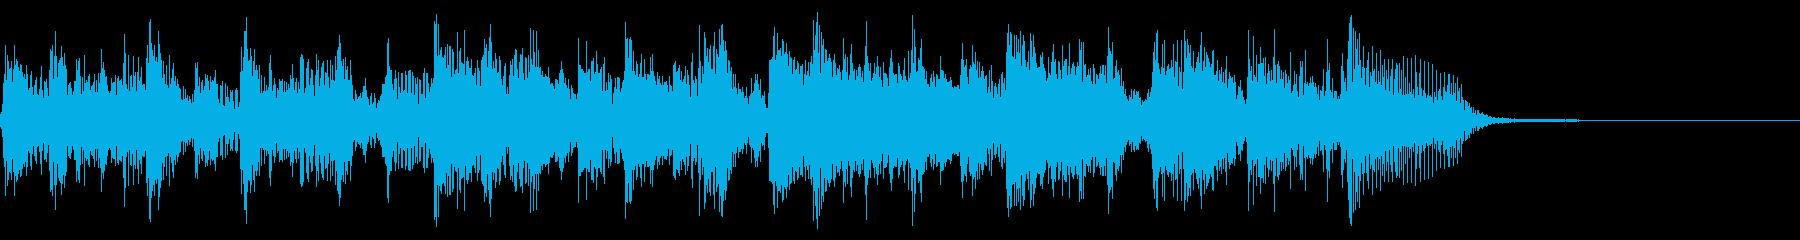 TOE-TAPPINGタグの再生済みの波形